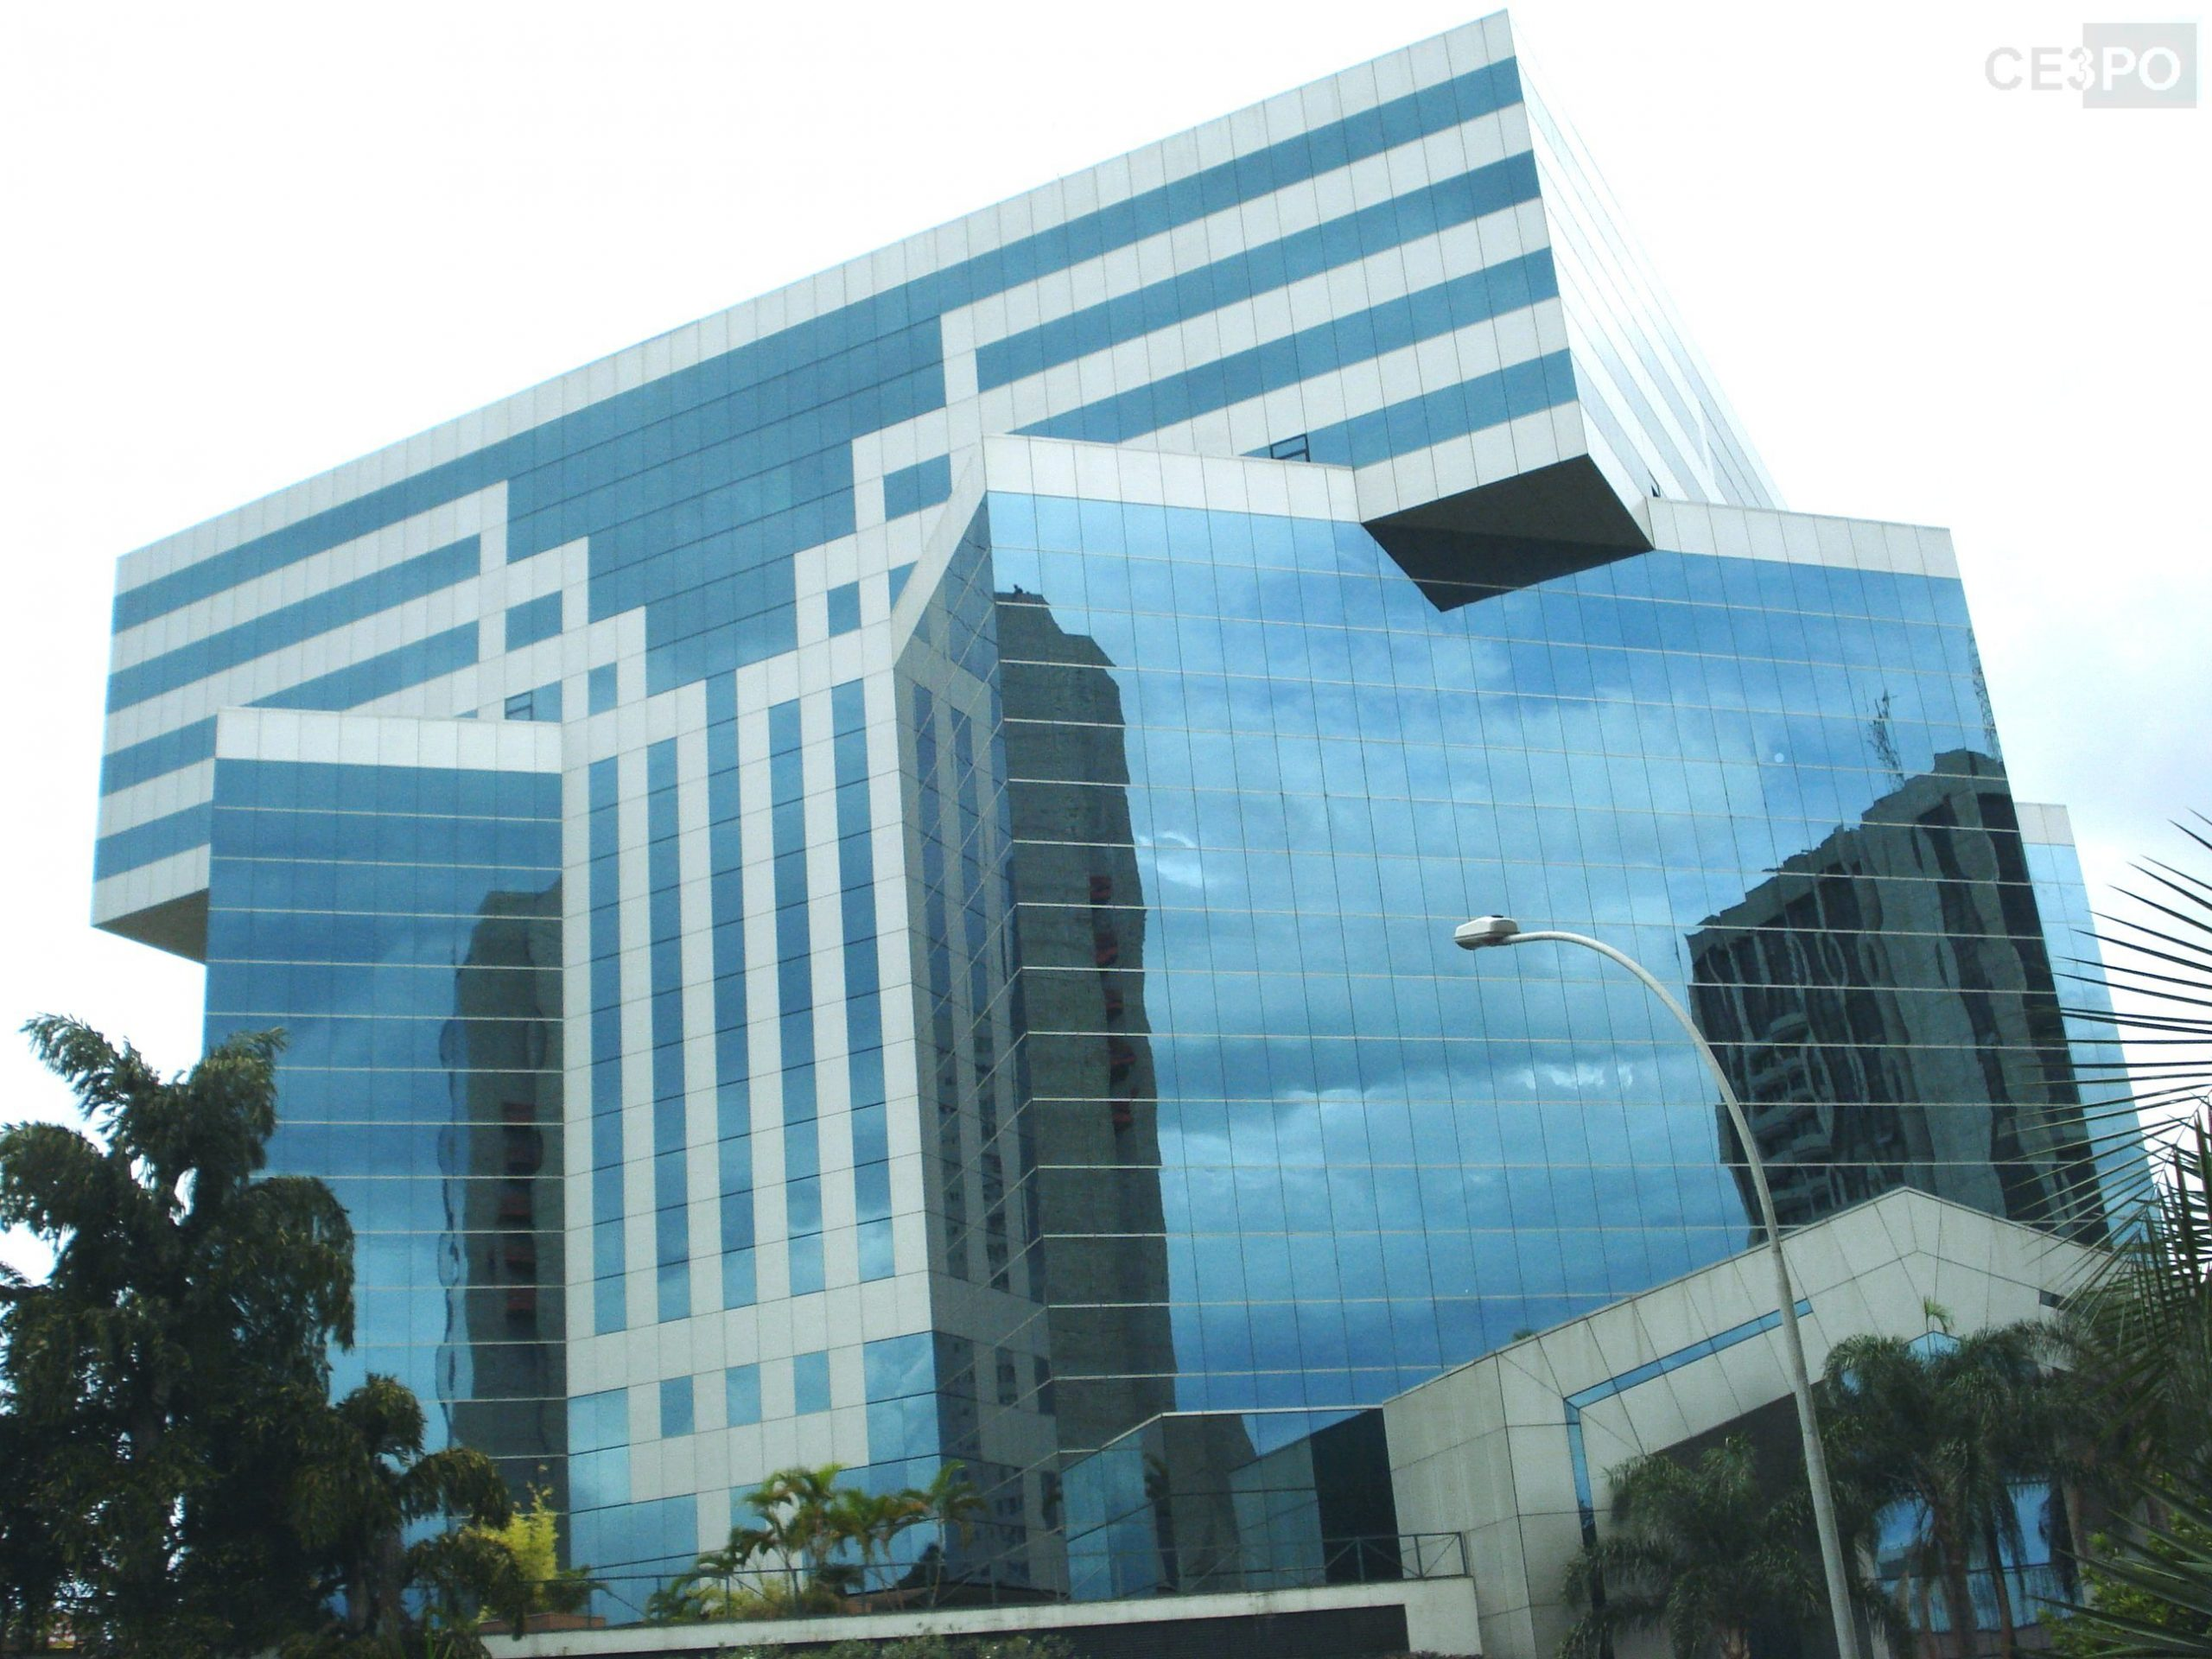 business building in Brazil